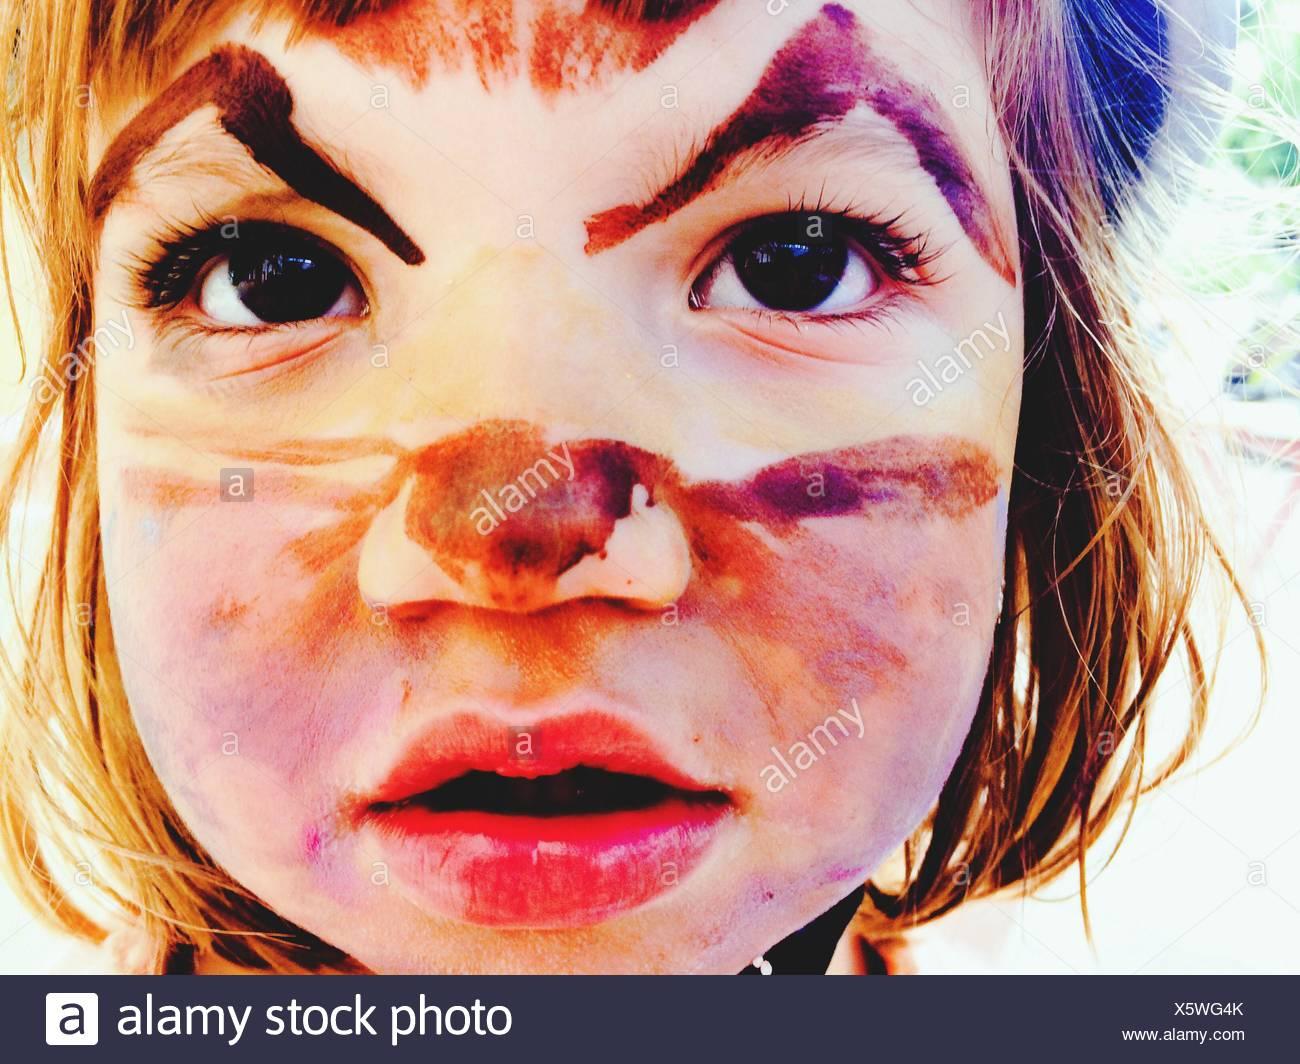 Girl Imitating Like A Cat - Stock Image